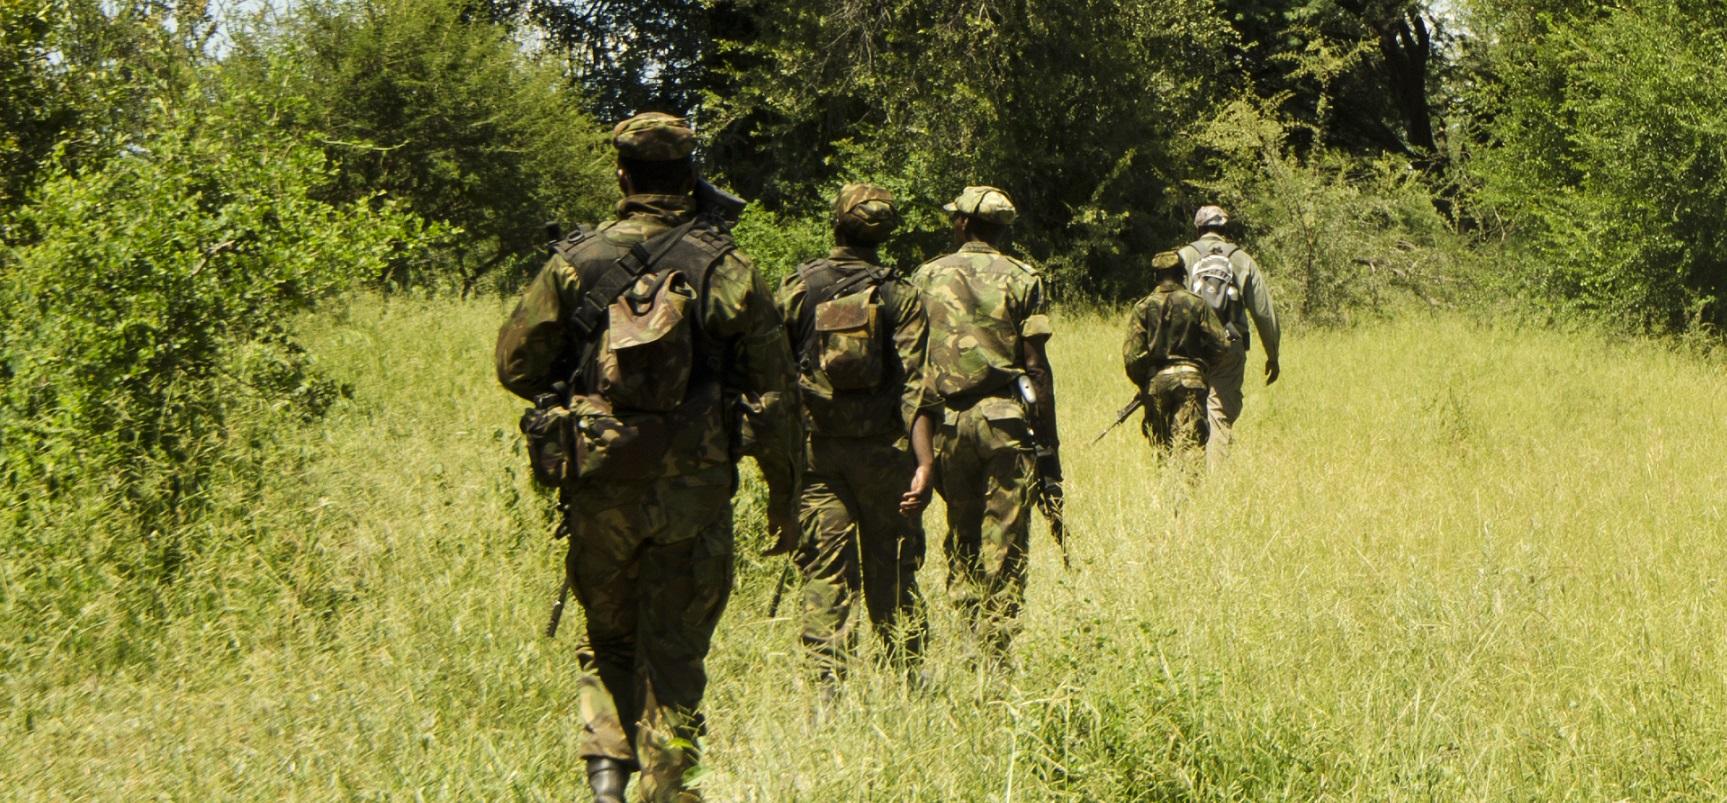 4 suspected rhino poachers/fishermen killed on the Chobe!